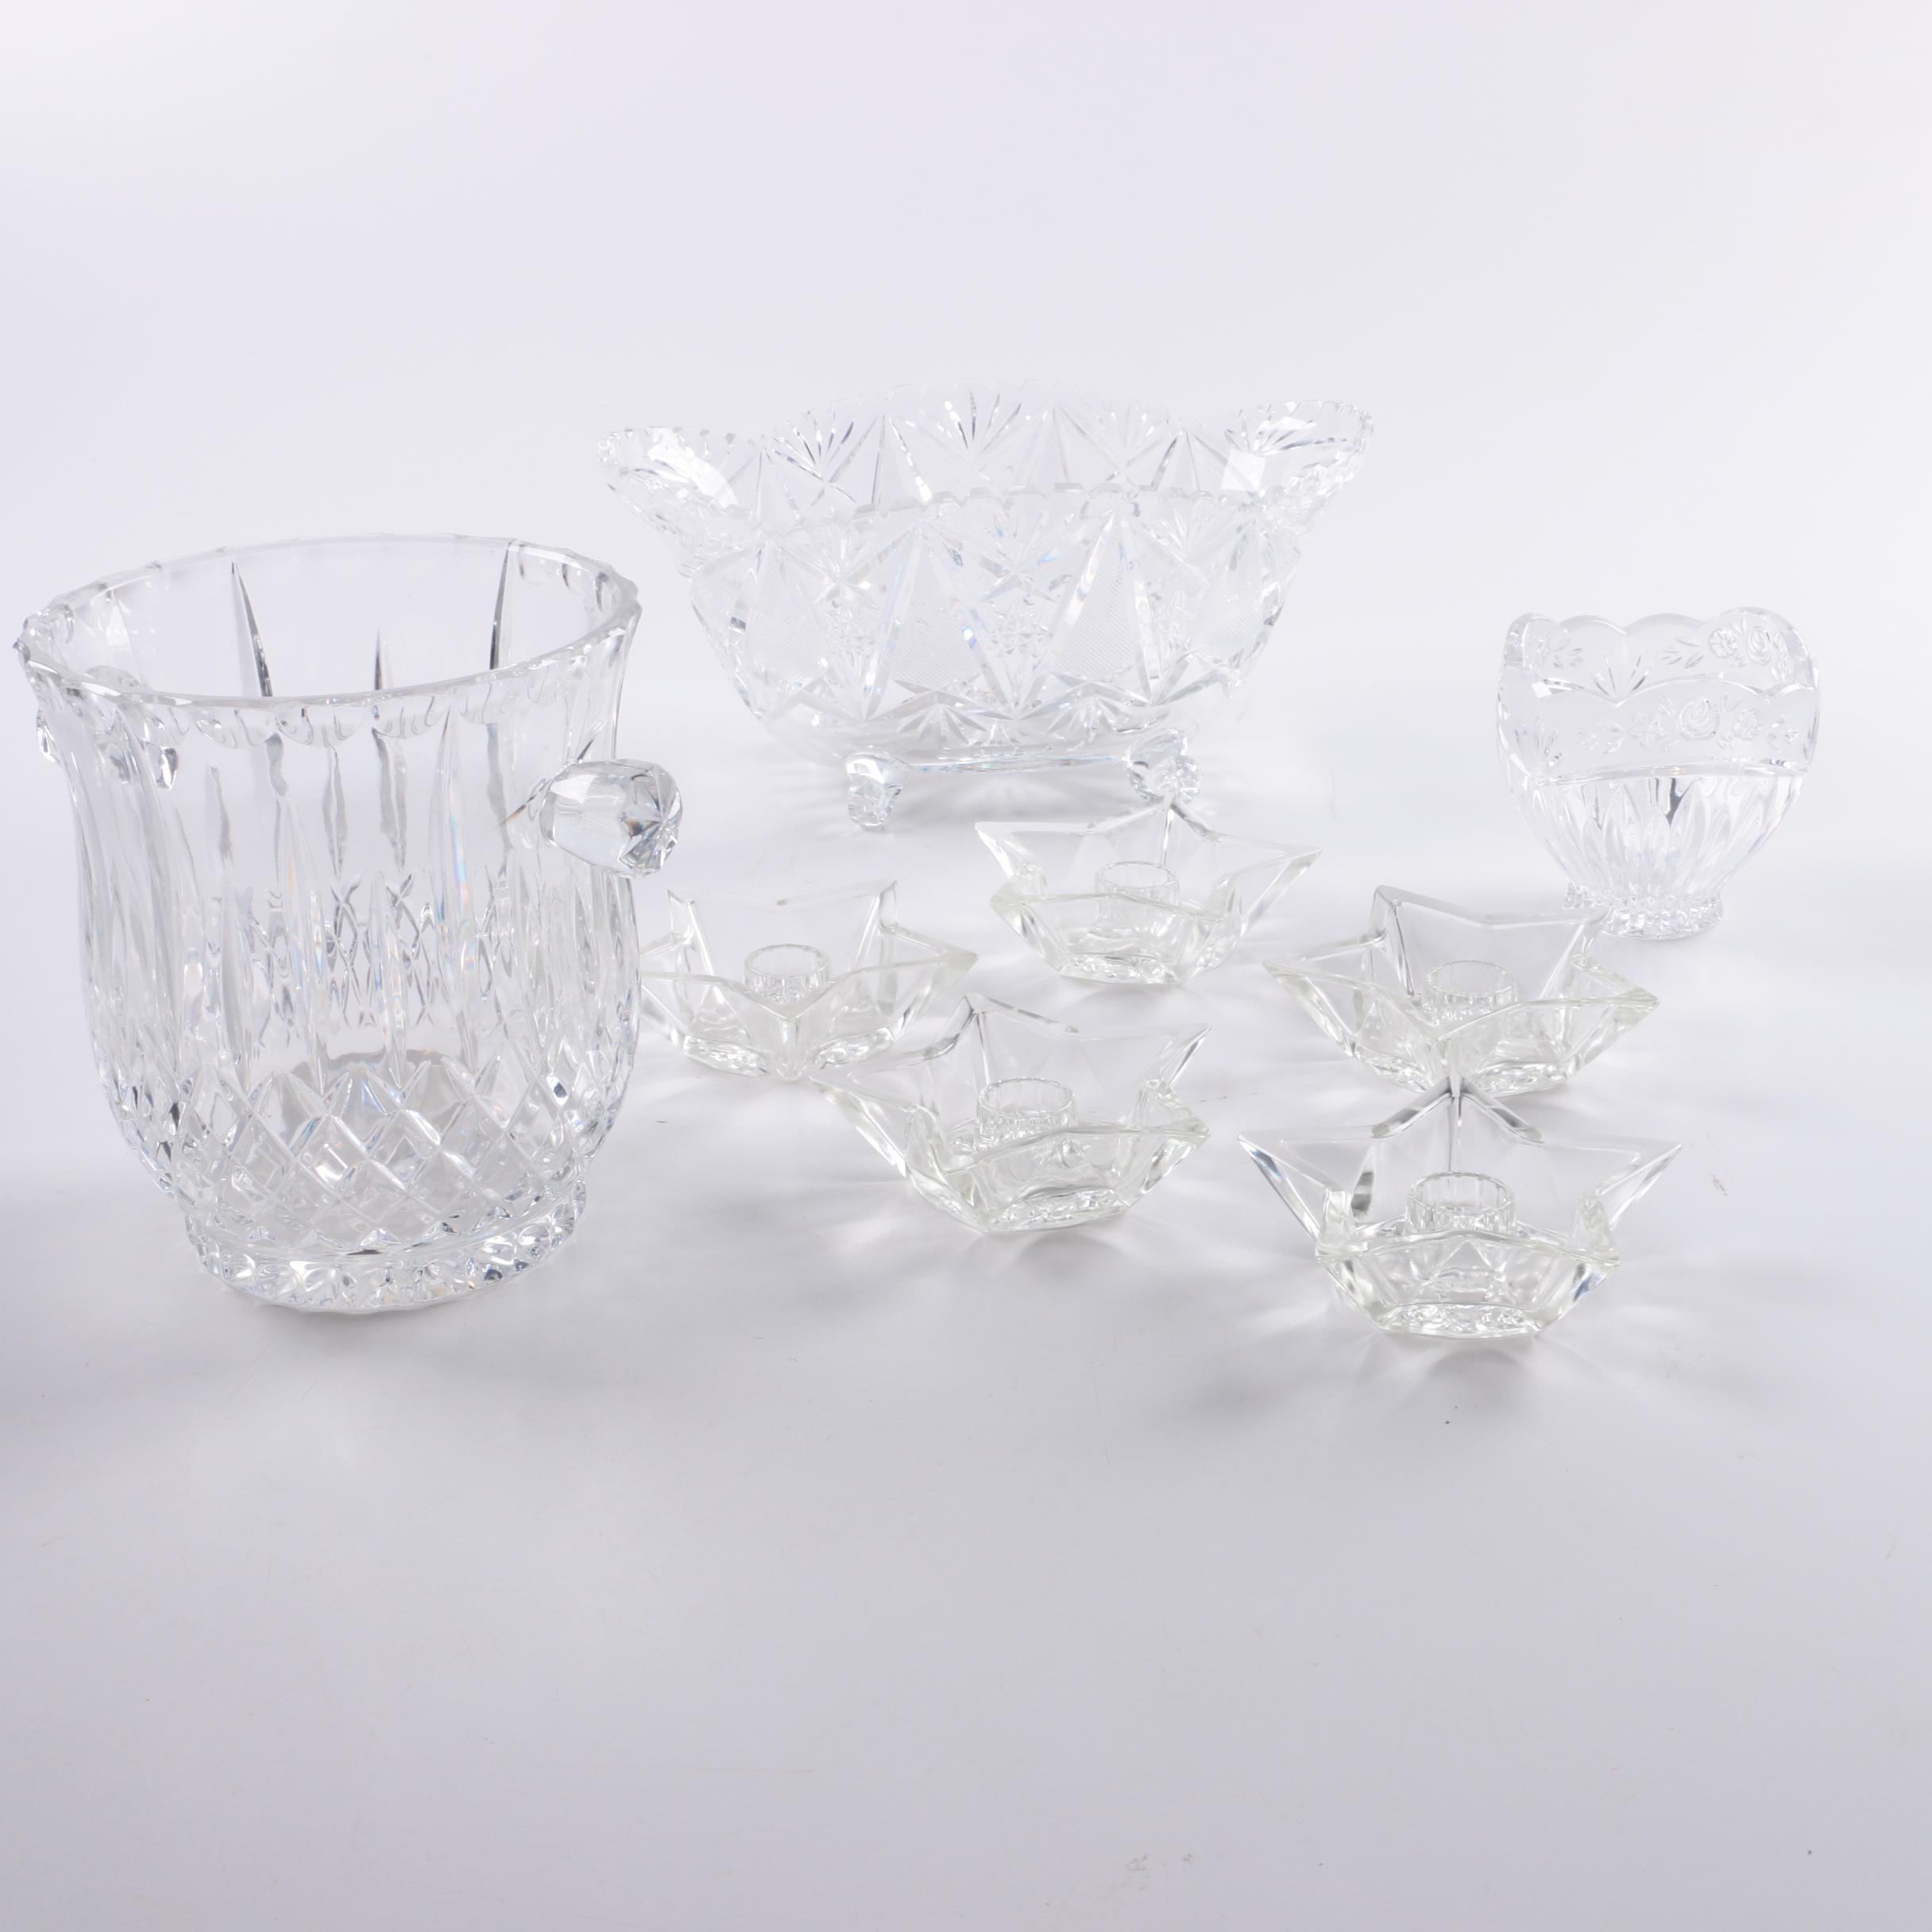 Assortment of Glass Tableware